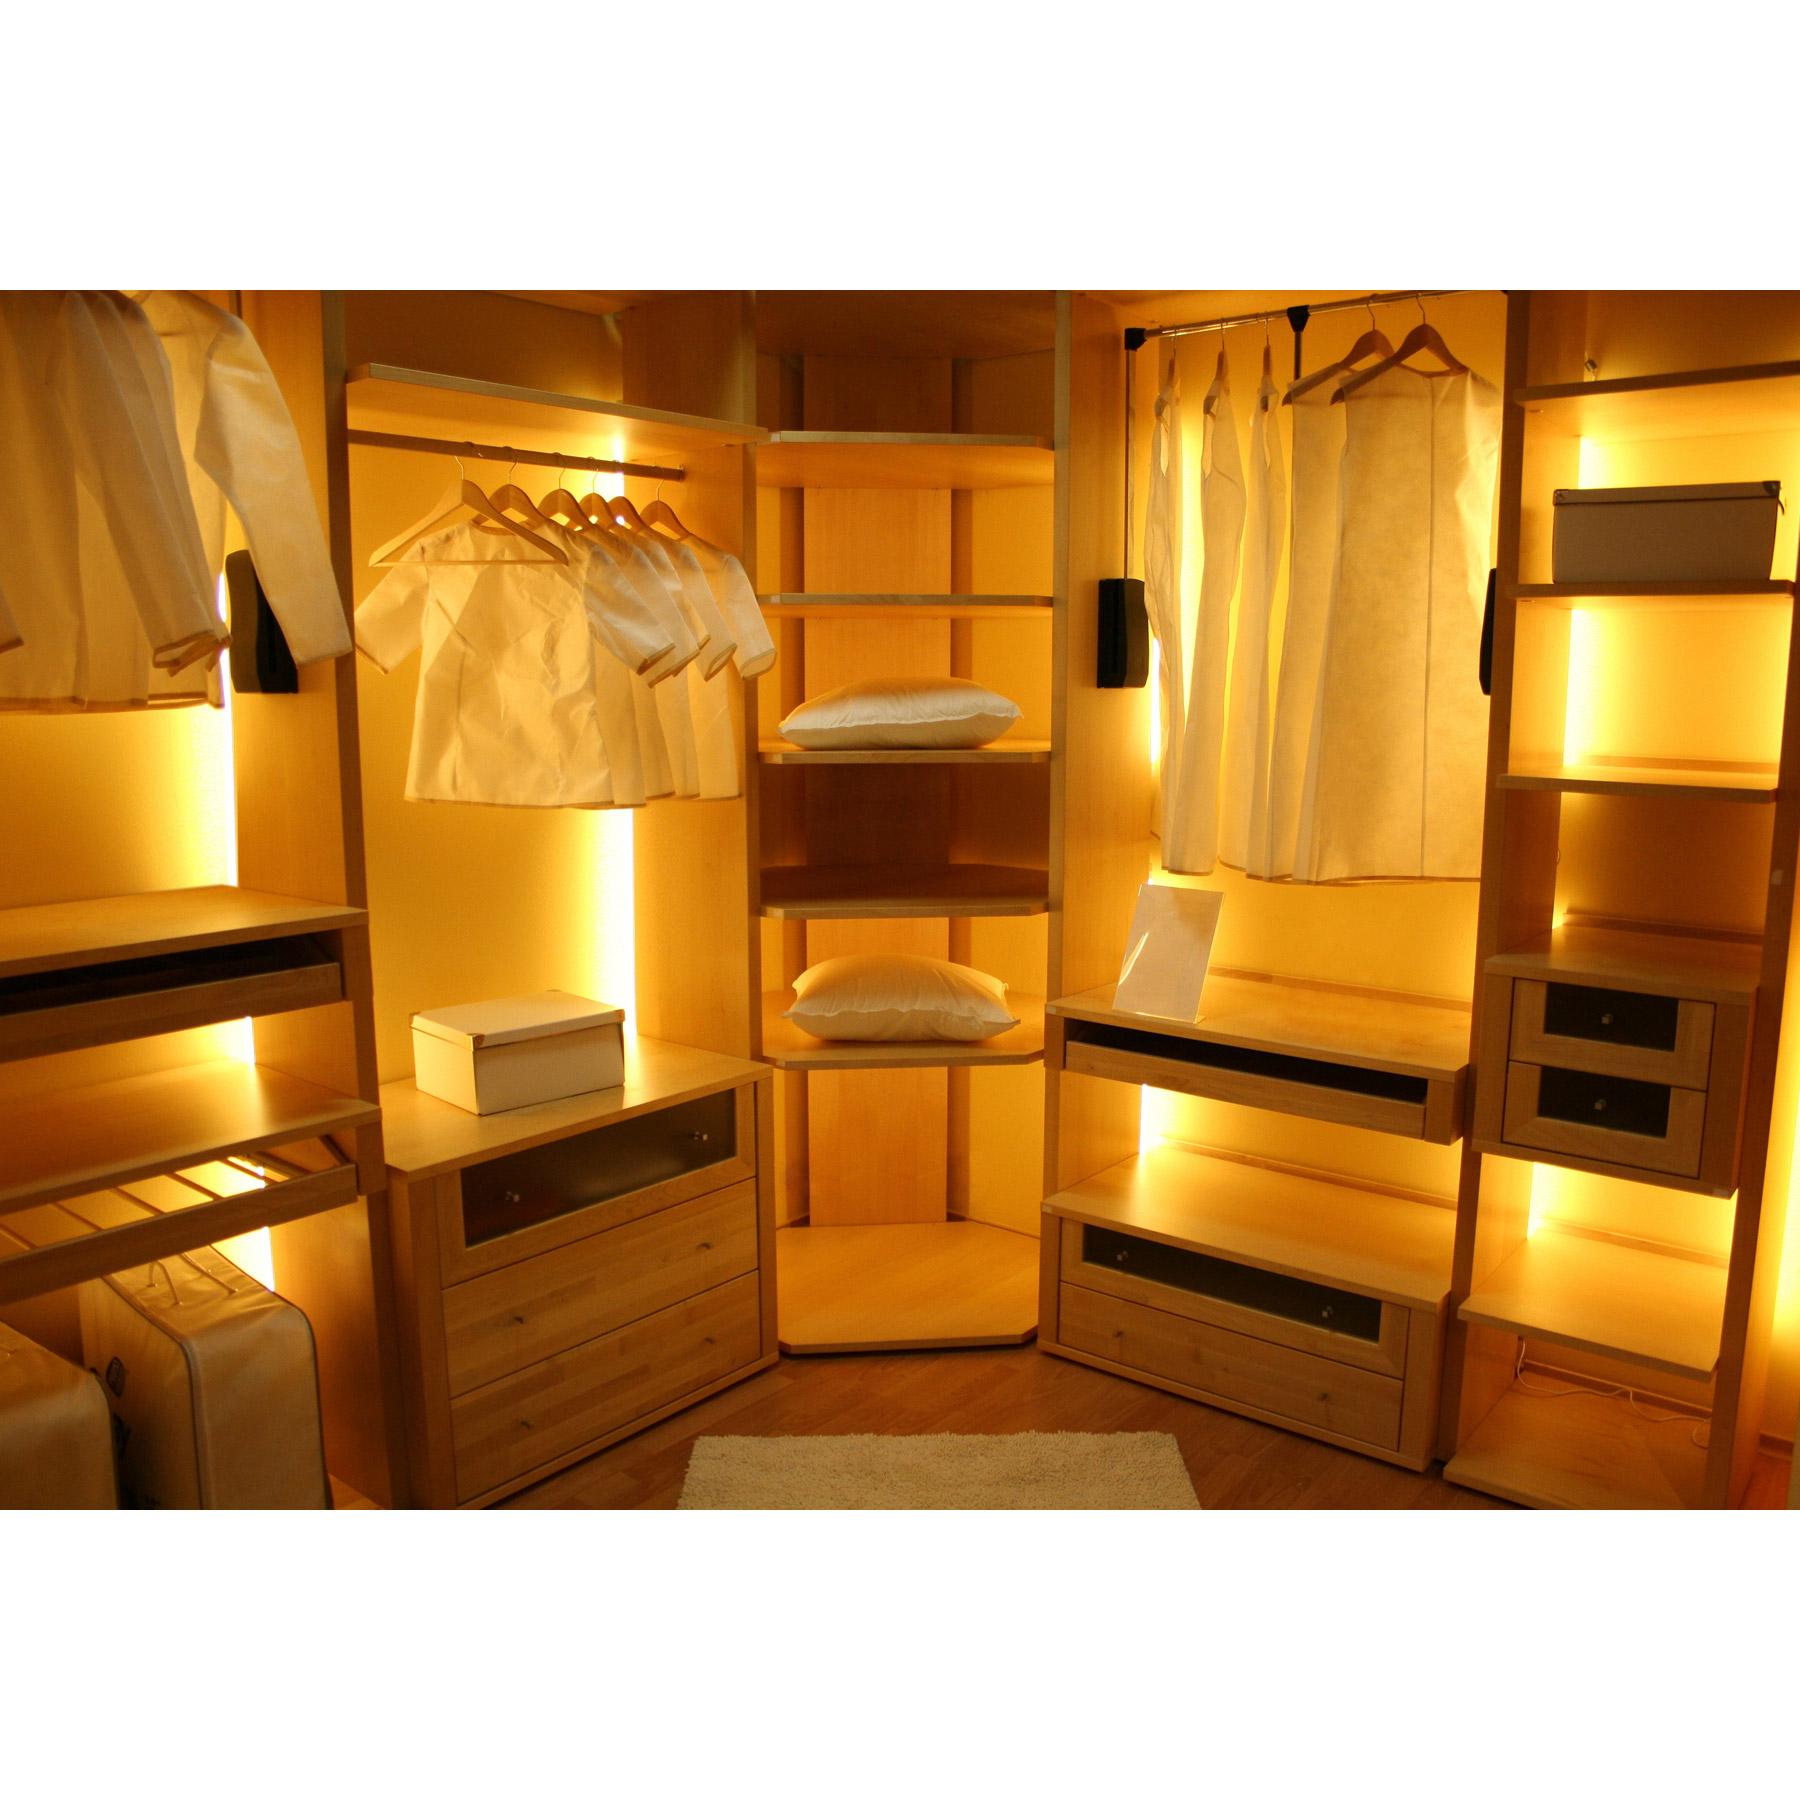 Pantry closet lighting